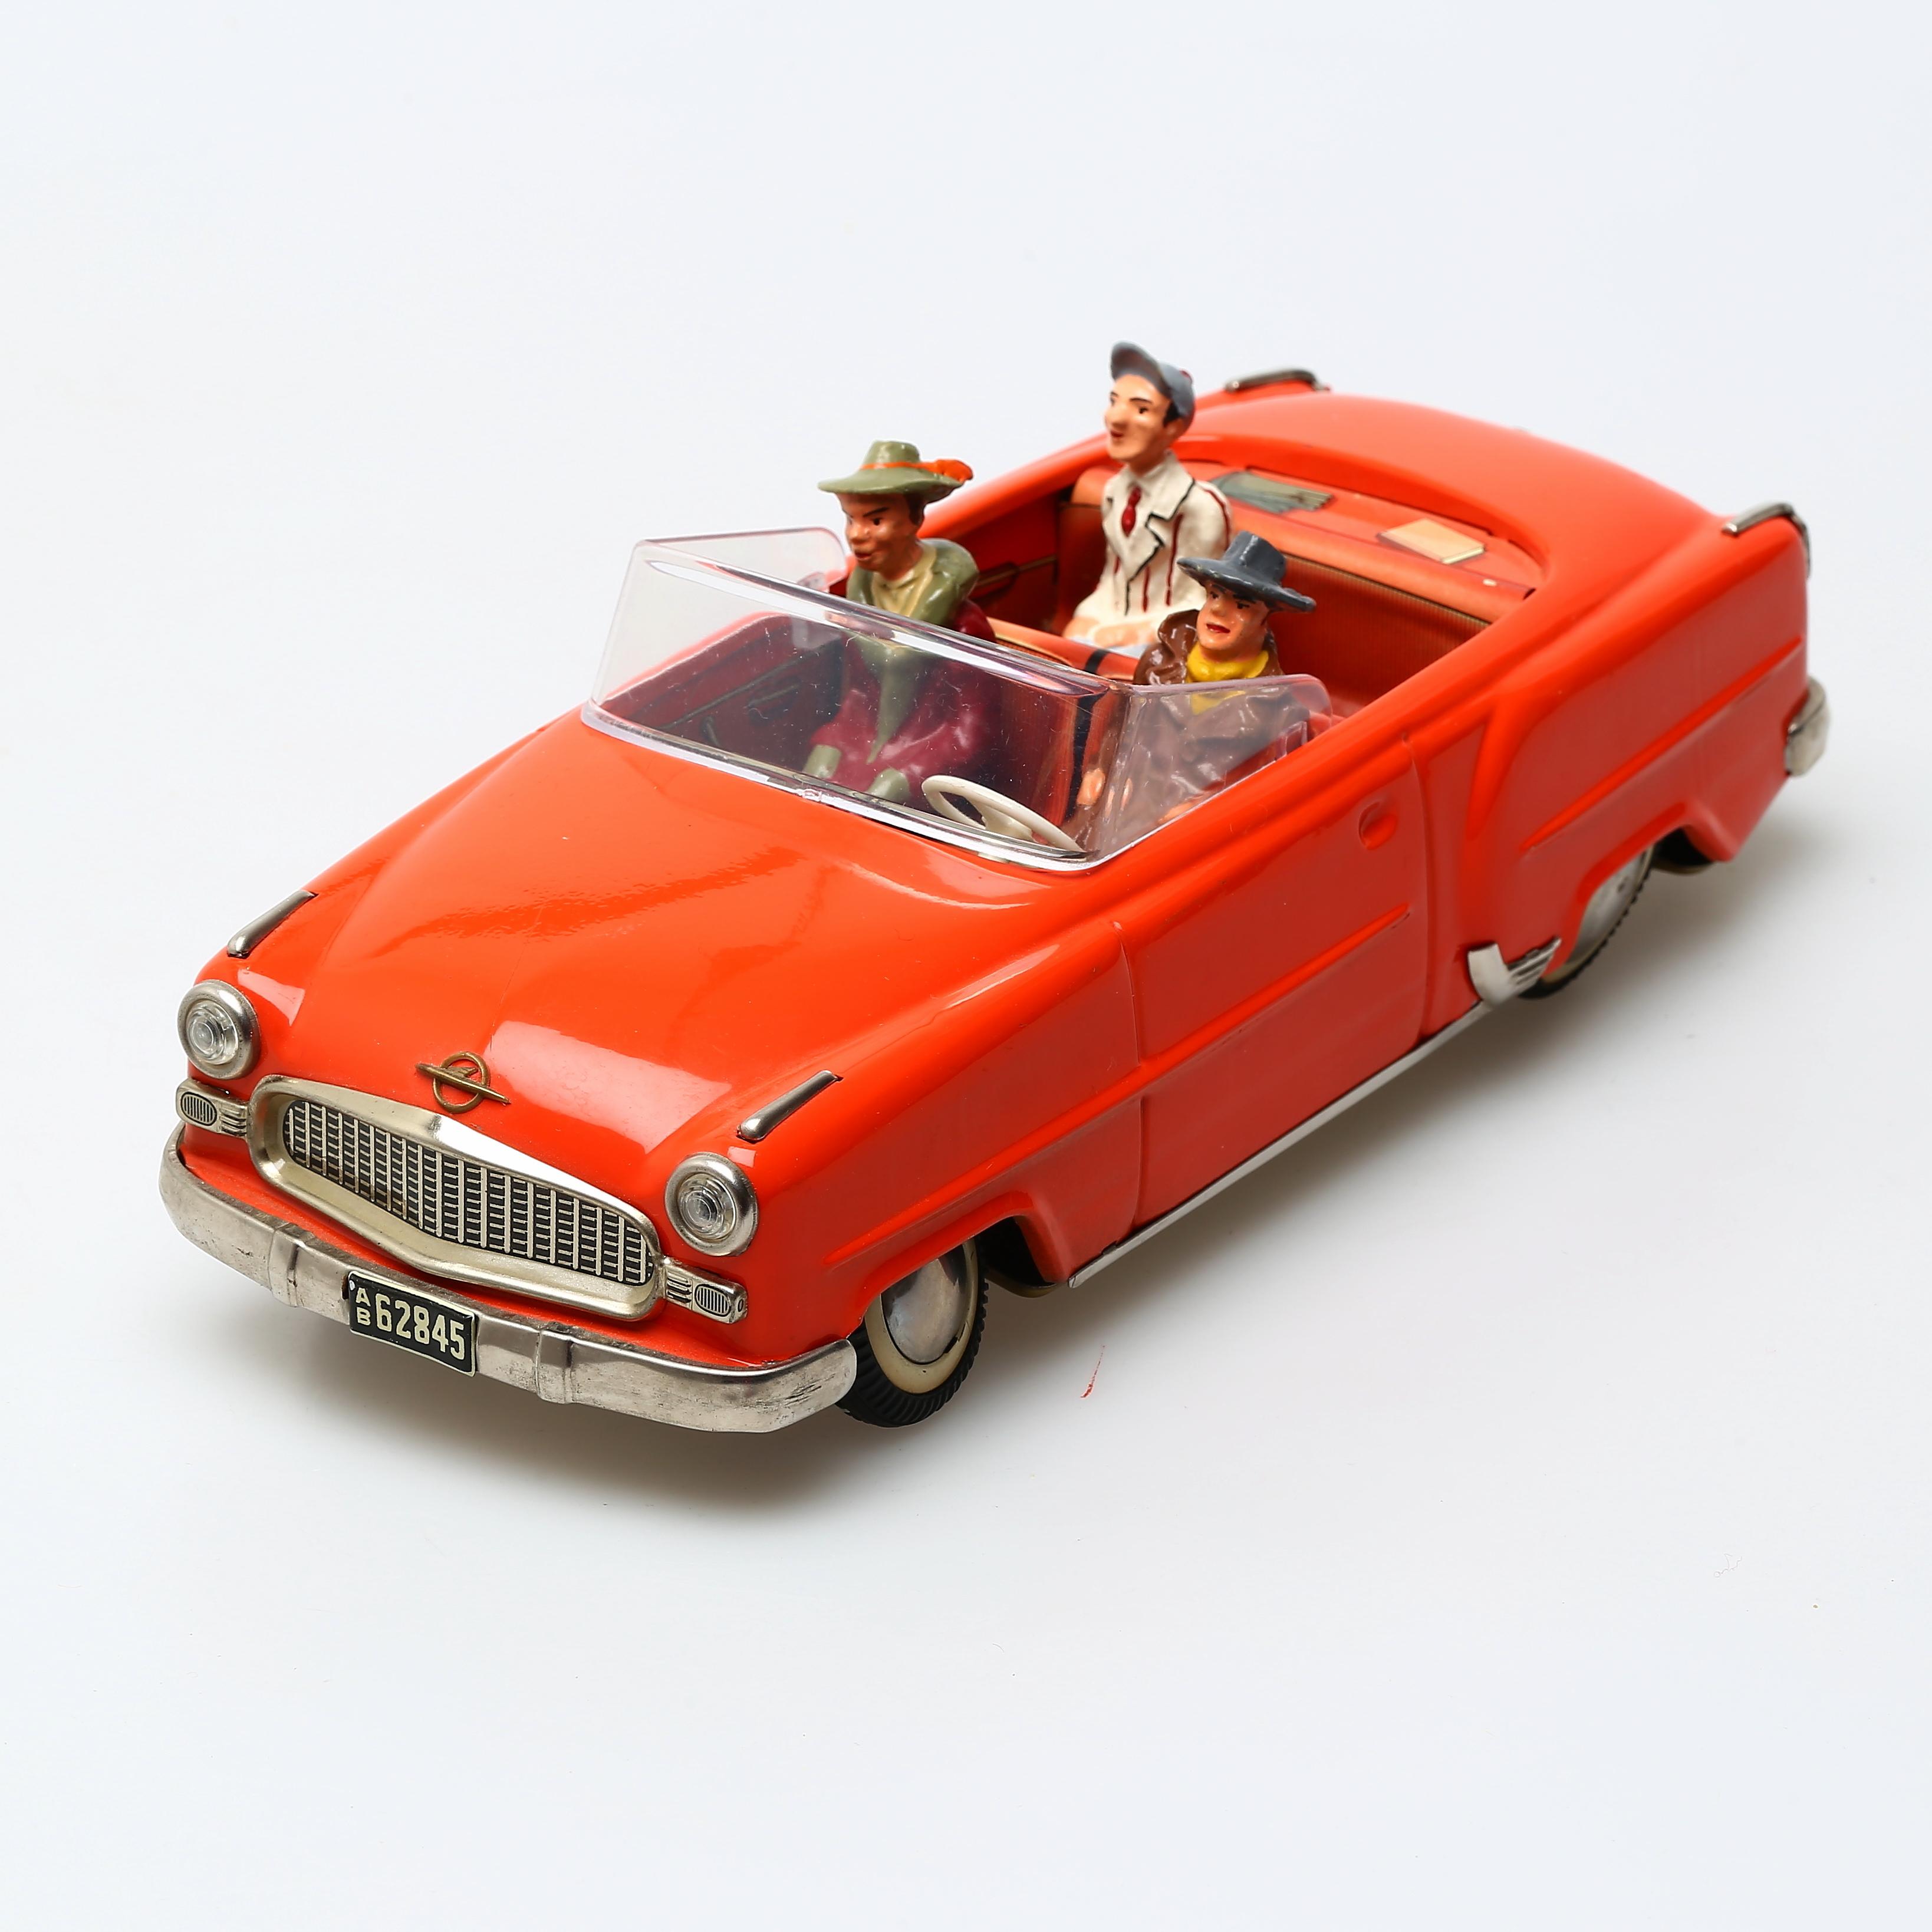 Arnold Opel Olympia Ovanlig Reprokartong Toys Auctionet